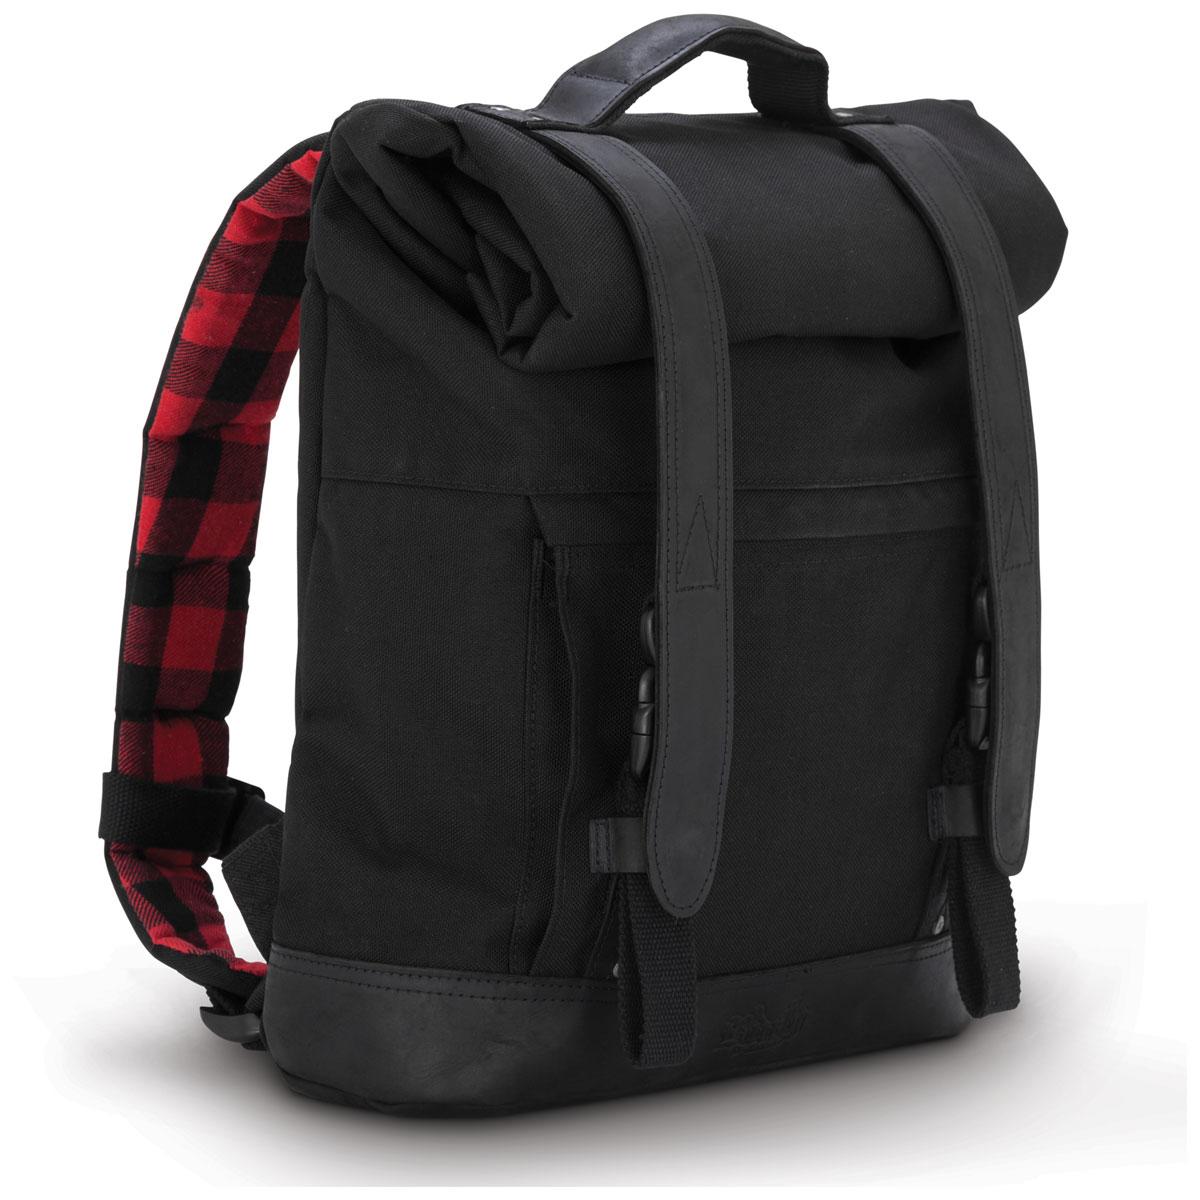 Burly Brand Voyager CORDURA Backpack